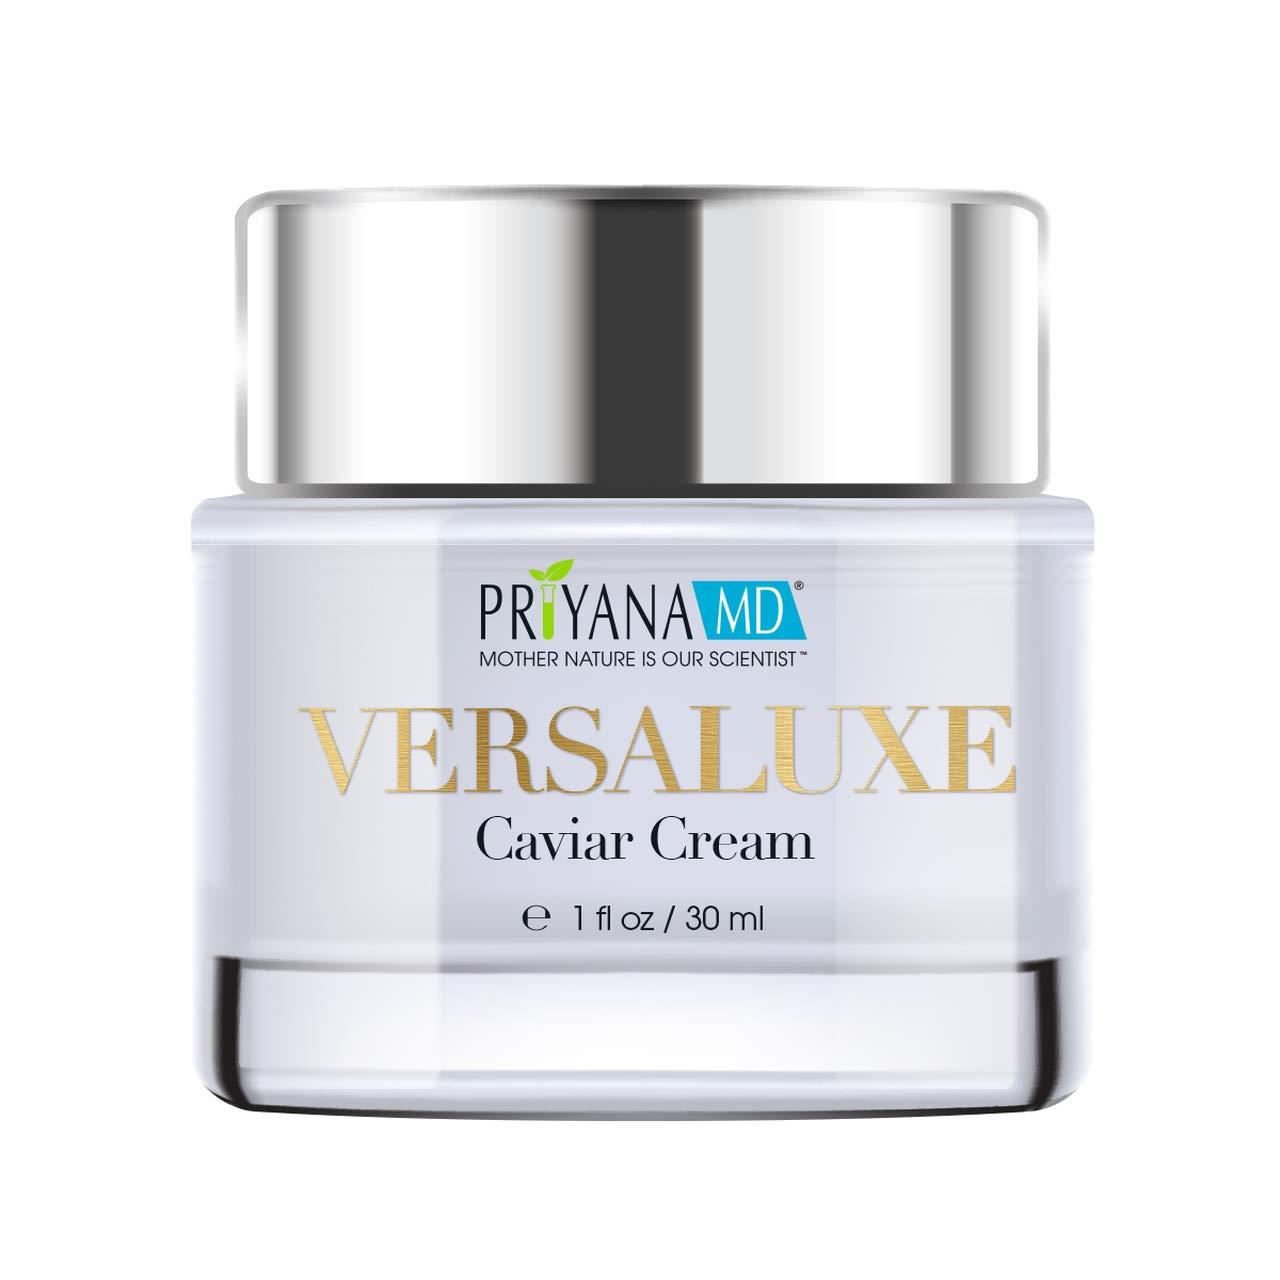 PriyanaMD VersaLuxe Caviar Cream Powerful and ストアー Skin Hy 定番 Anti-Aging